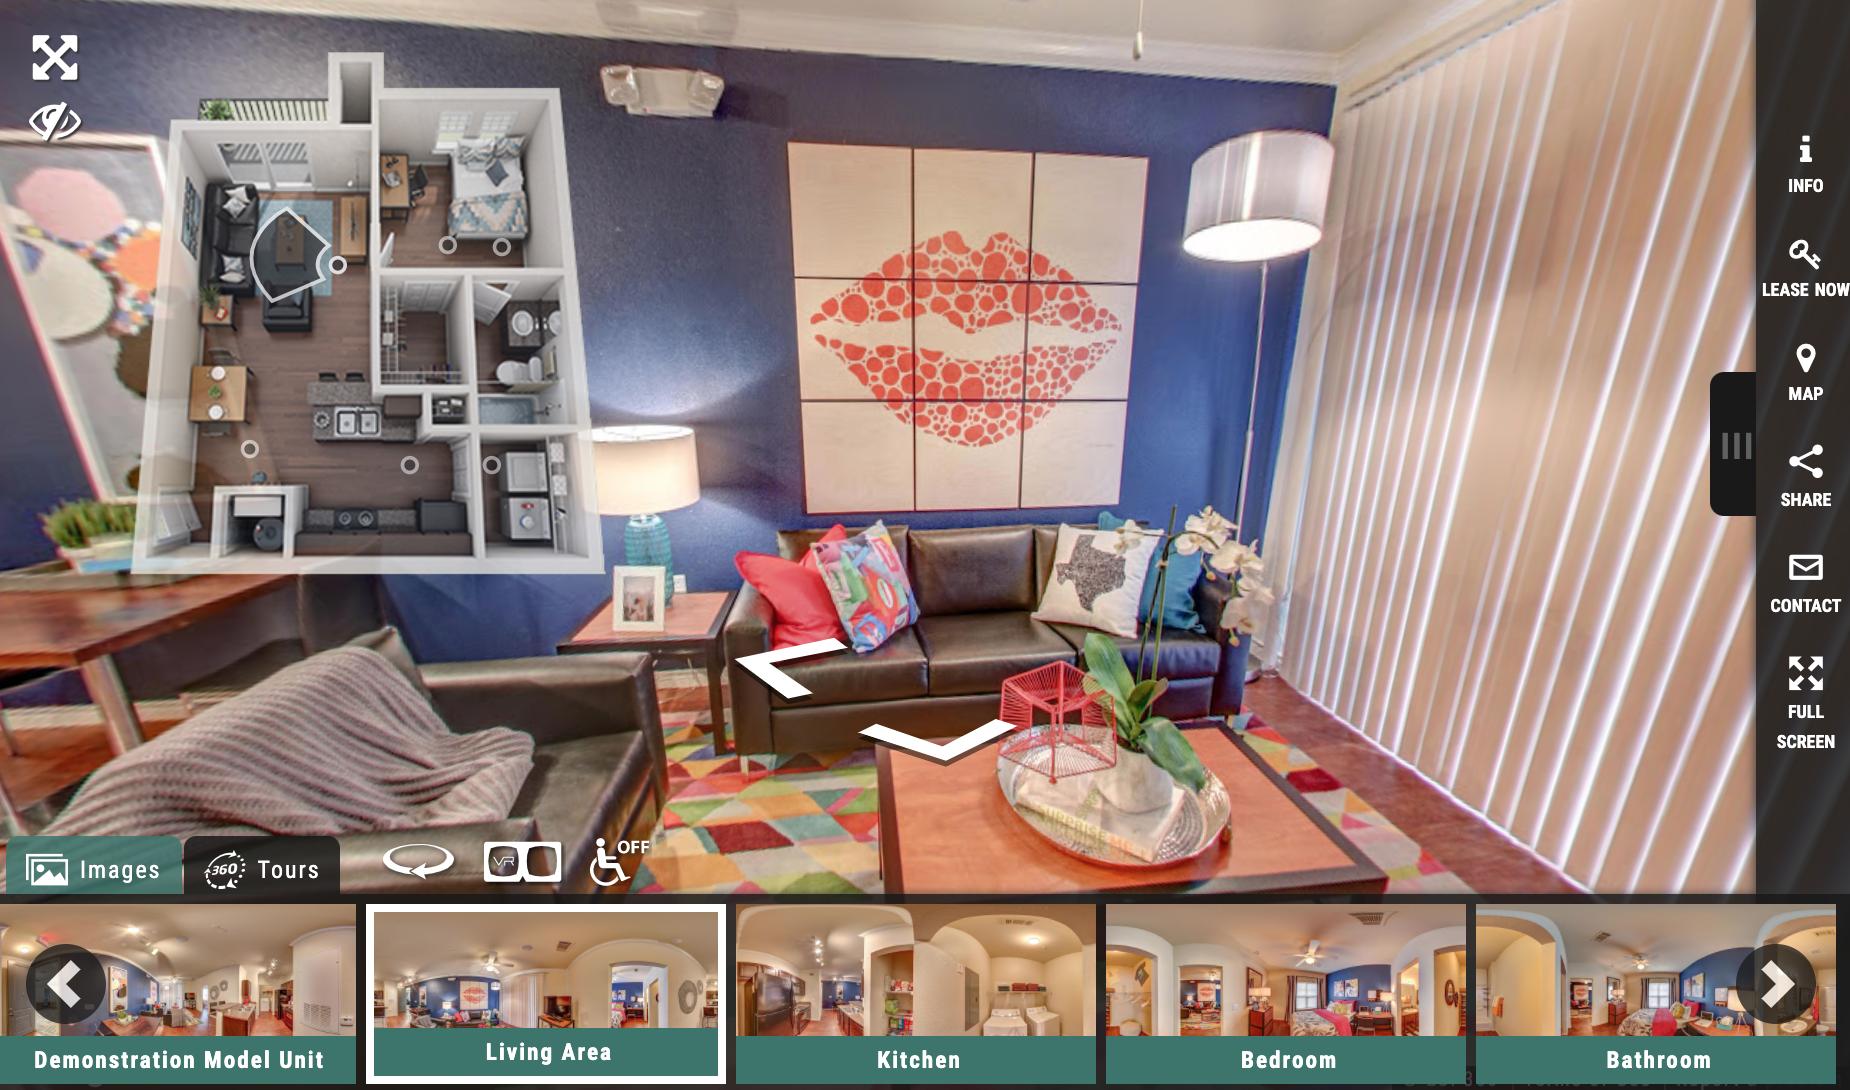 Student Housing Virtual Tour - Model Unit